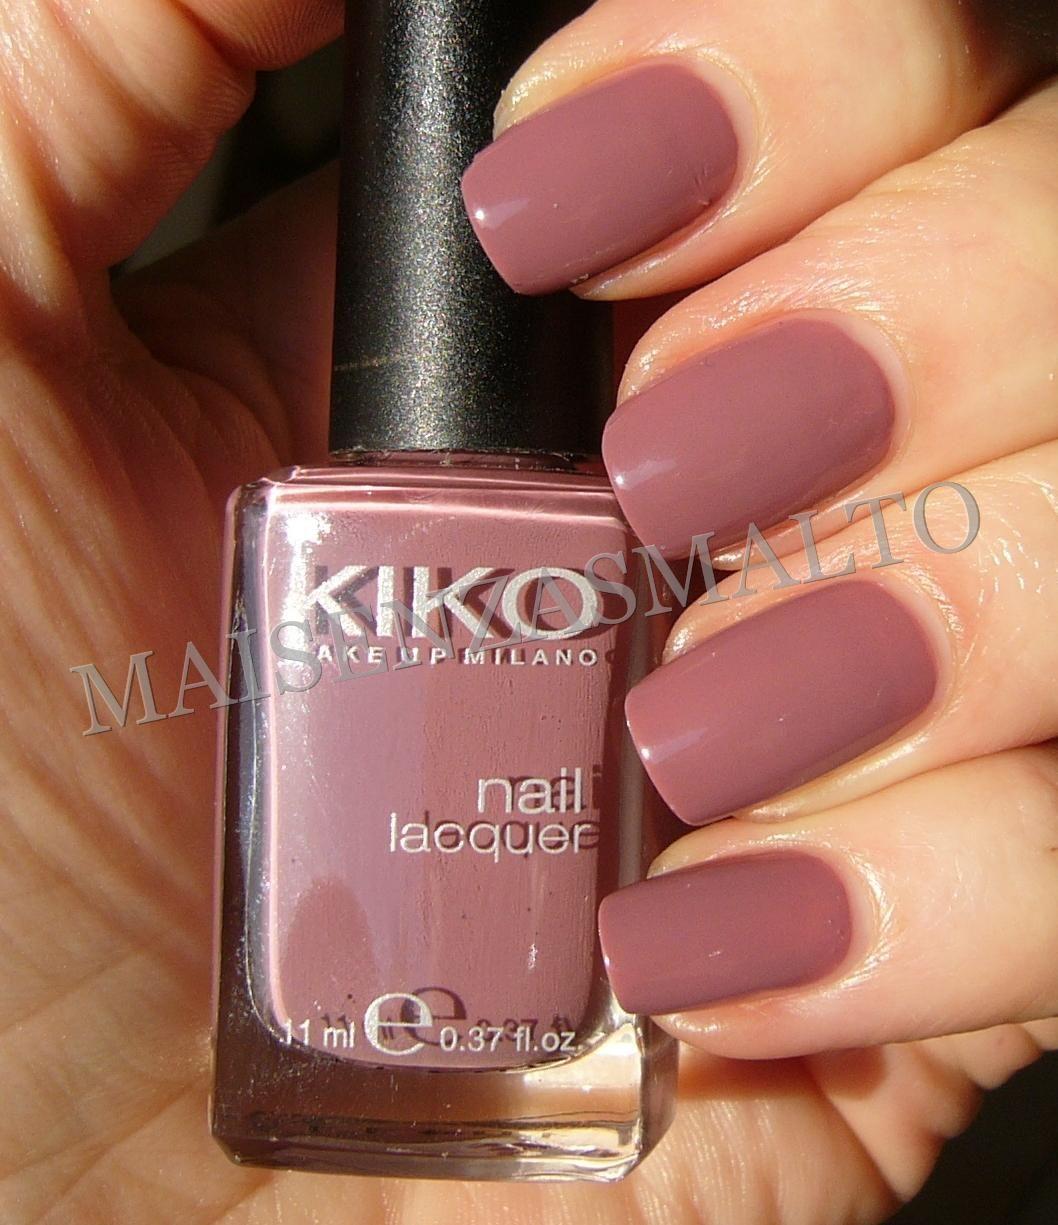 Kiko 365 vernis nail polish pinterest tatoo for Kiko 365 tattoo rose